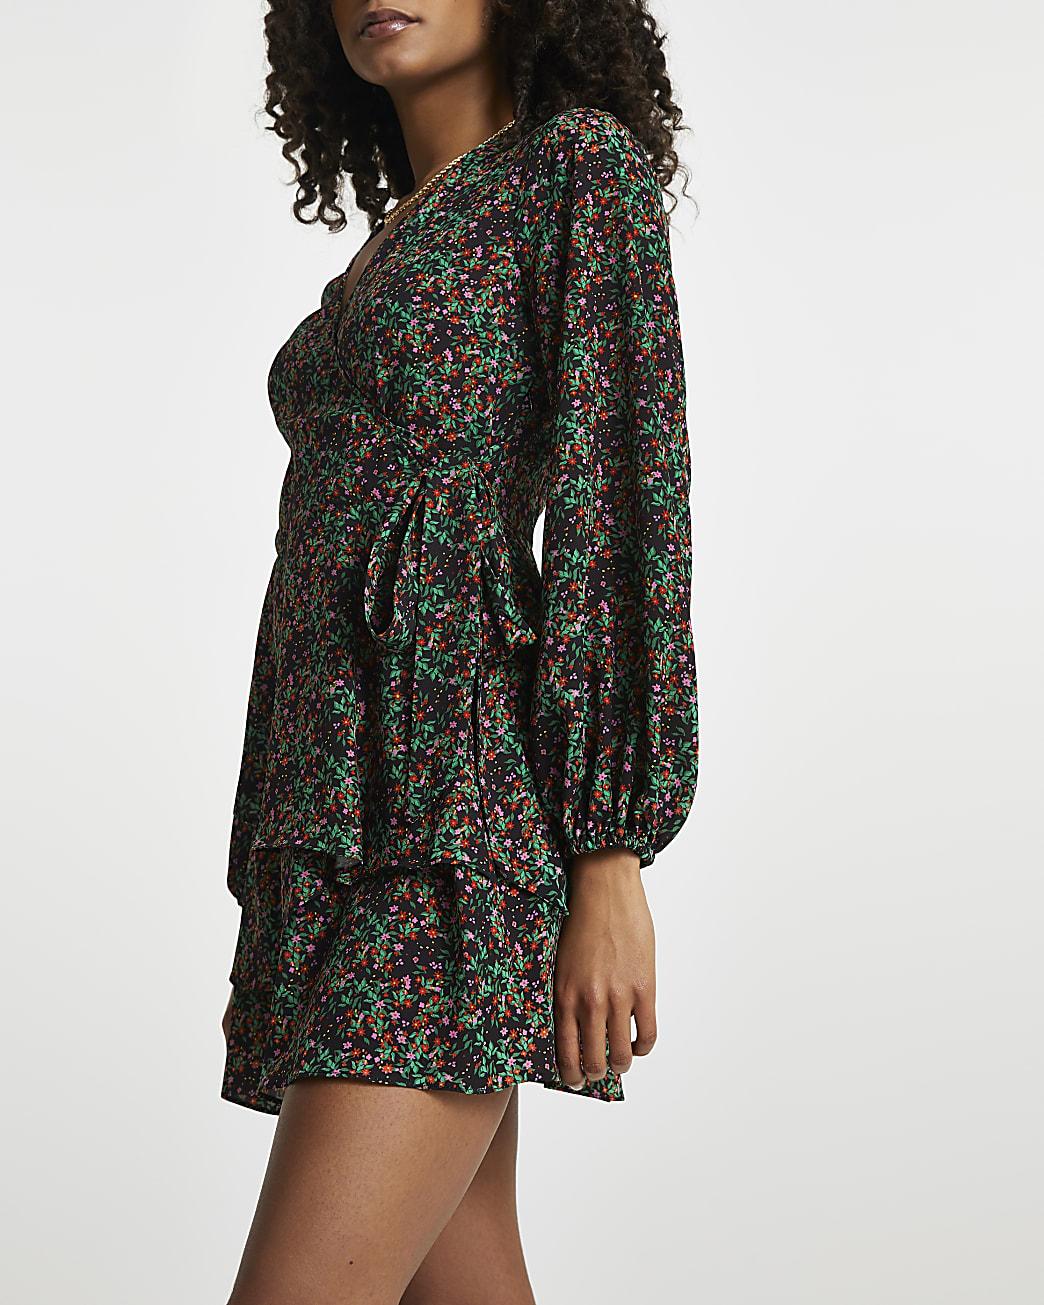 Black floral wrap dress